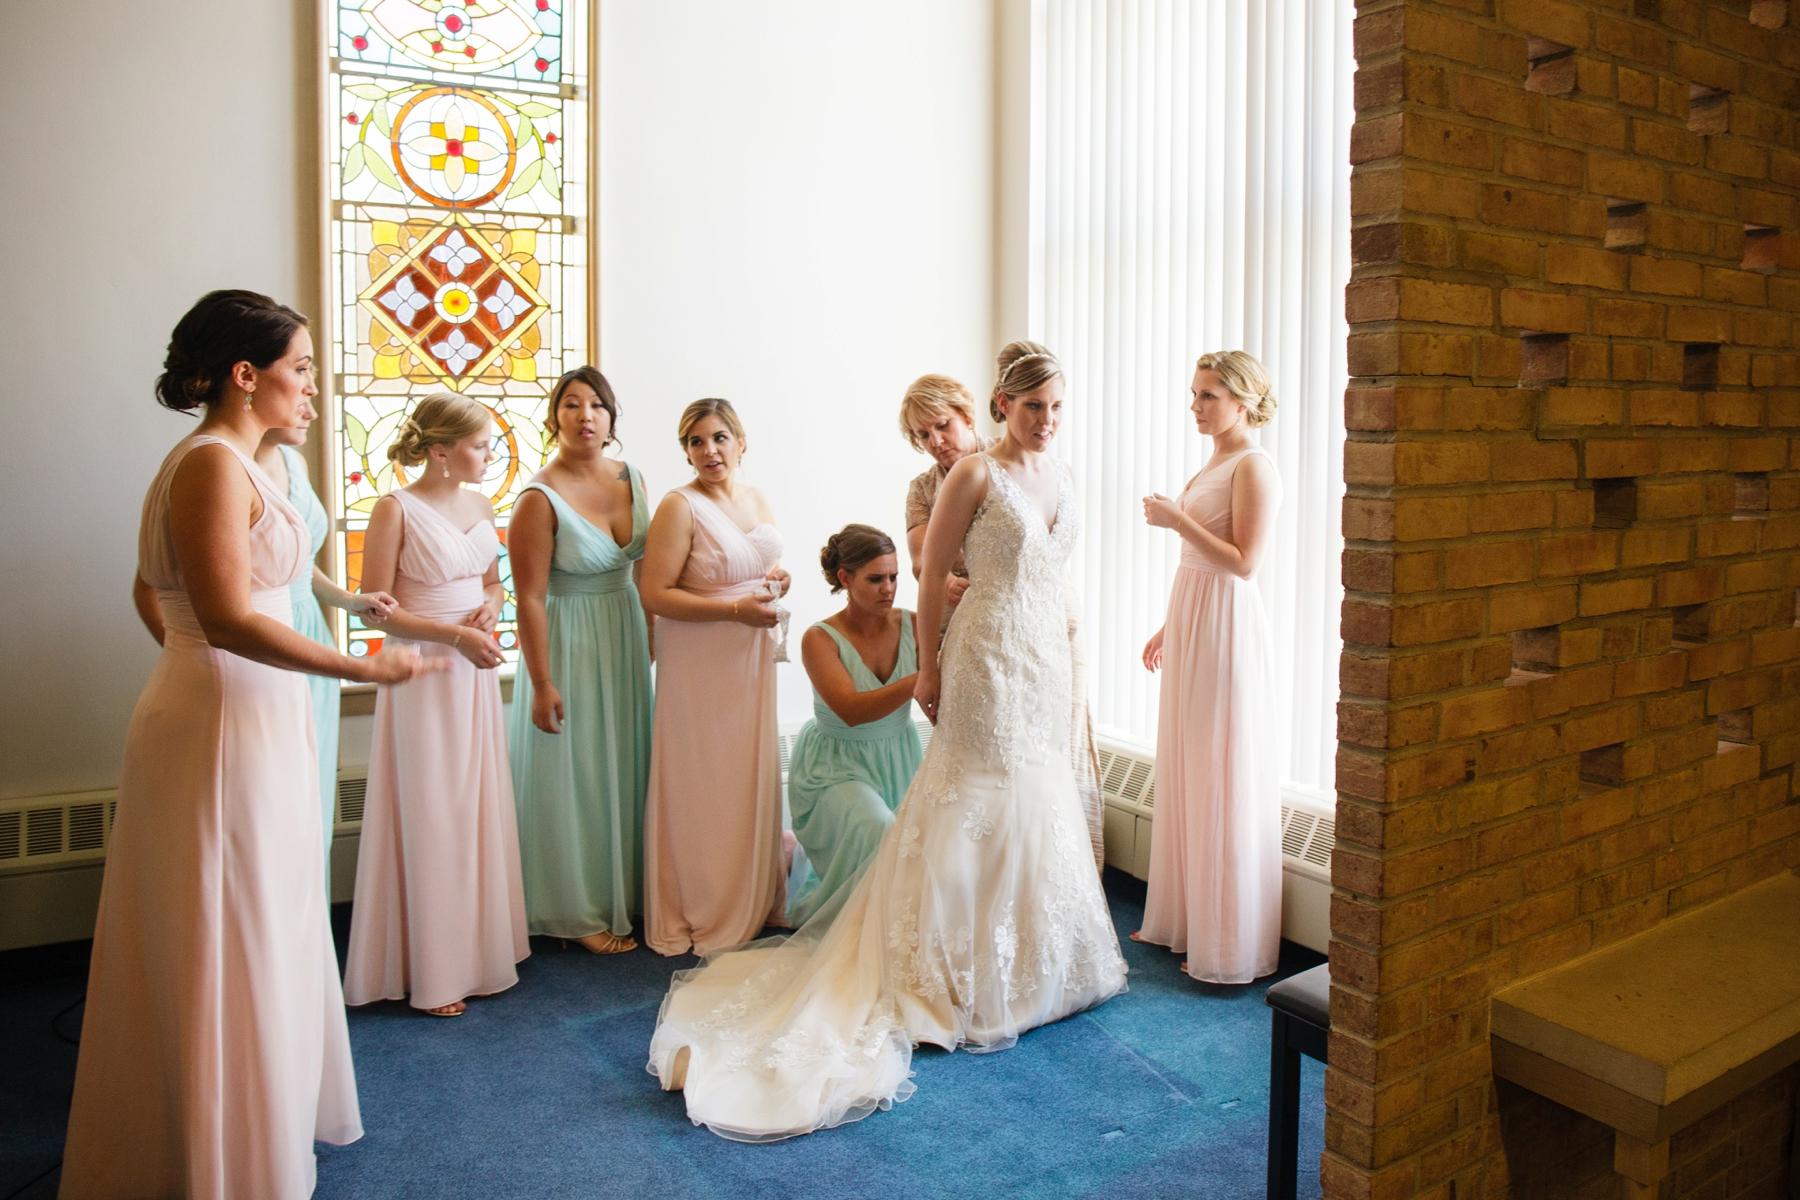 Ben_Jillian_Midland_Baycity_Wedding_0023.jpg